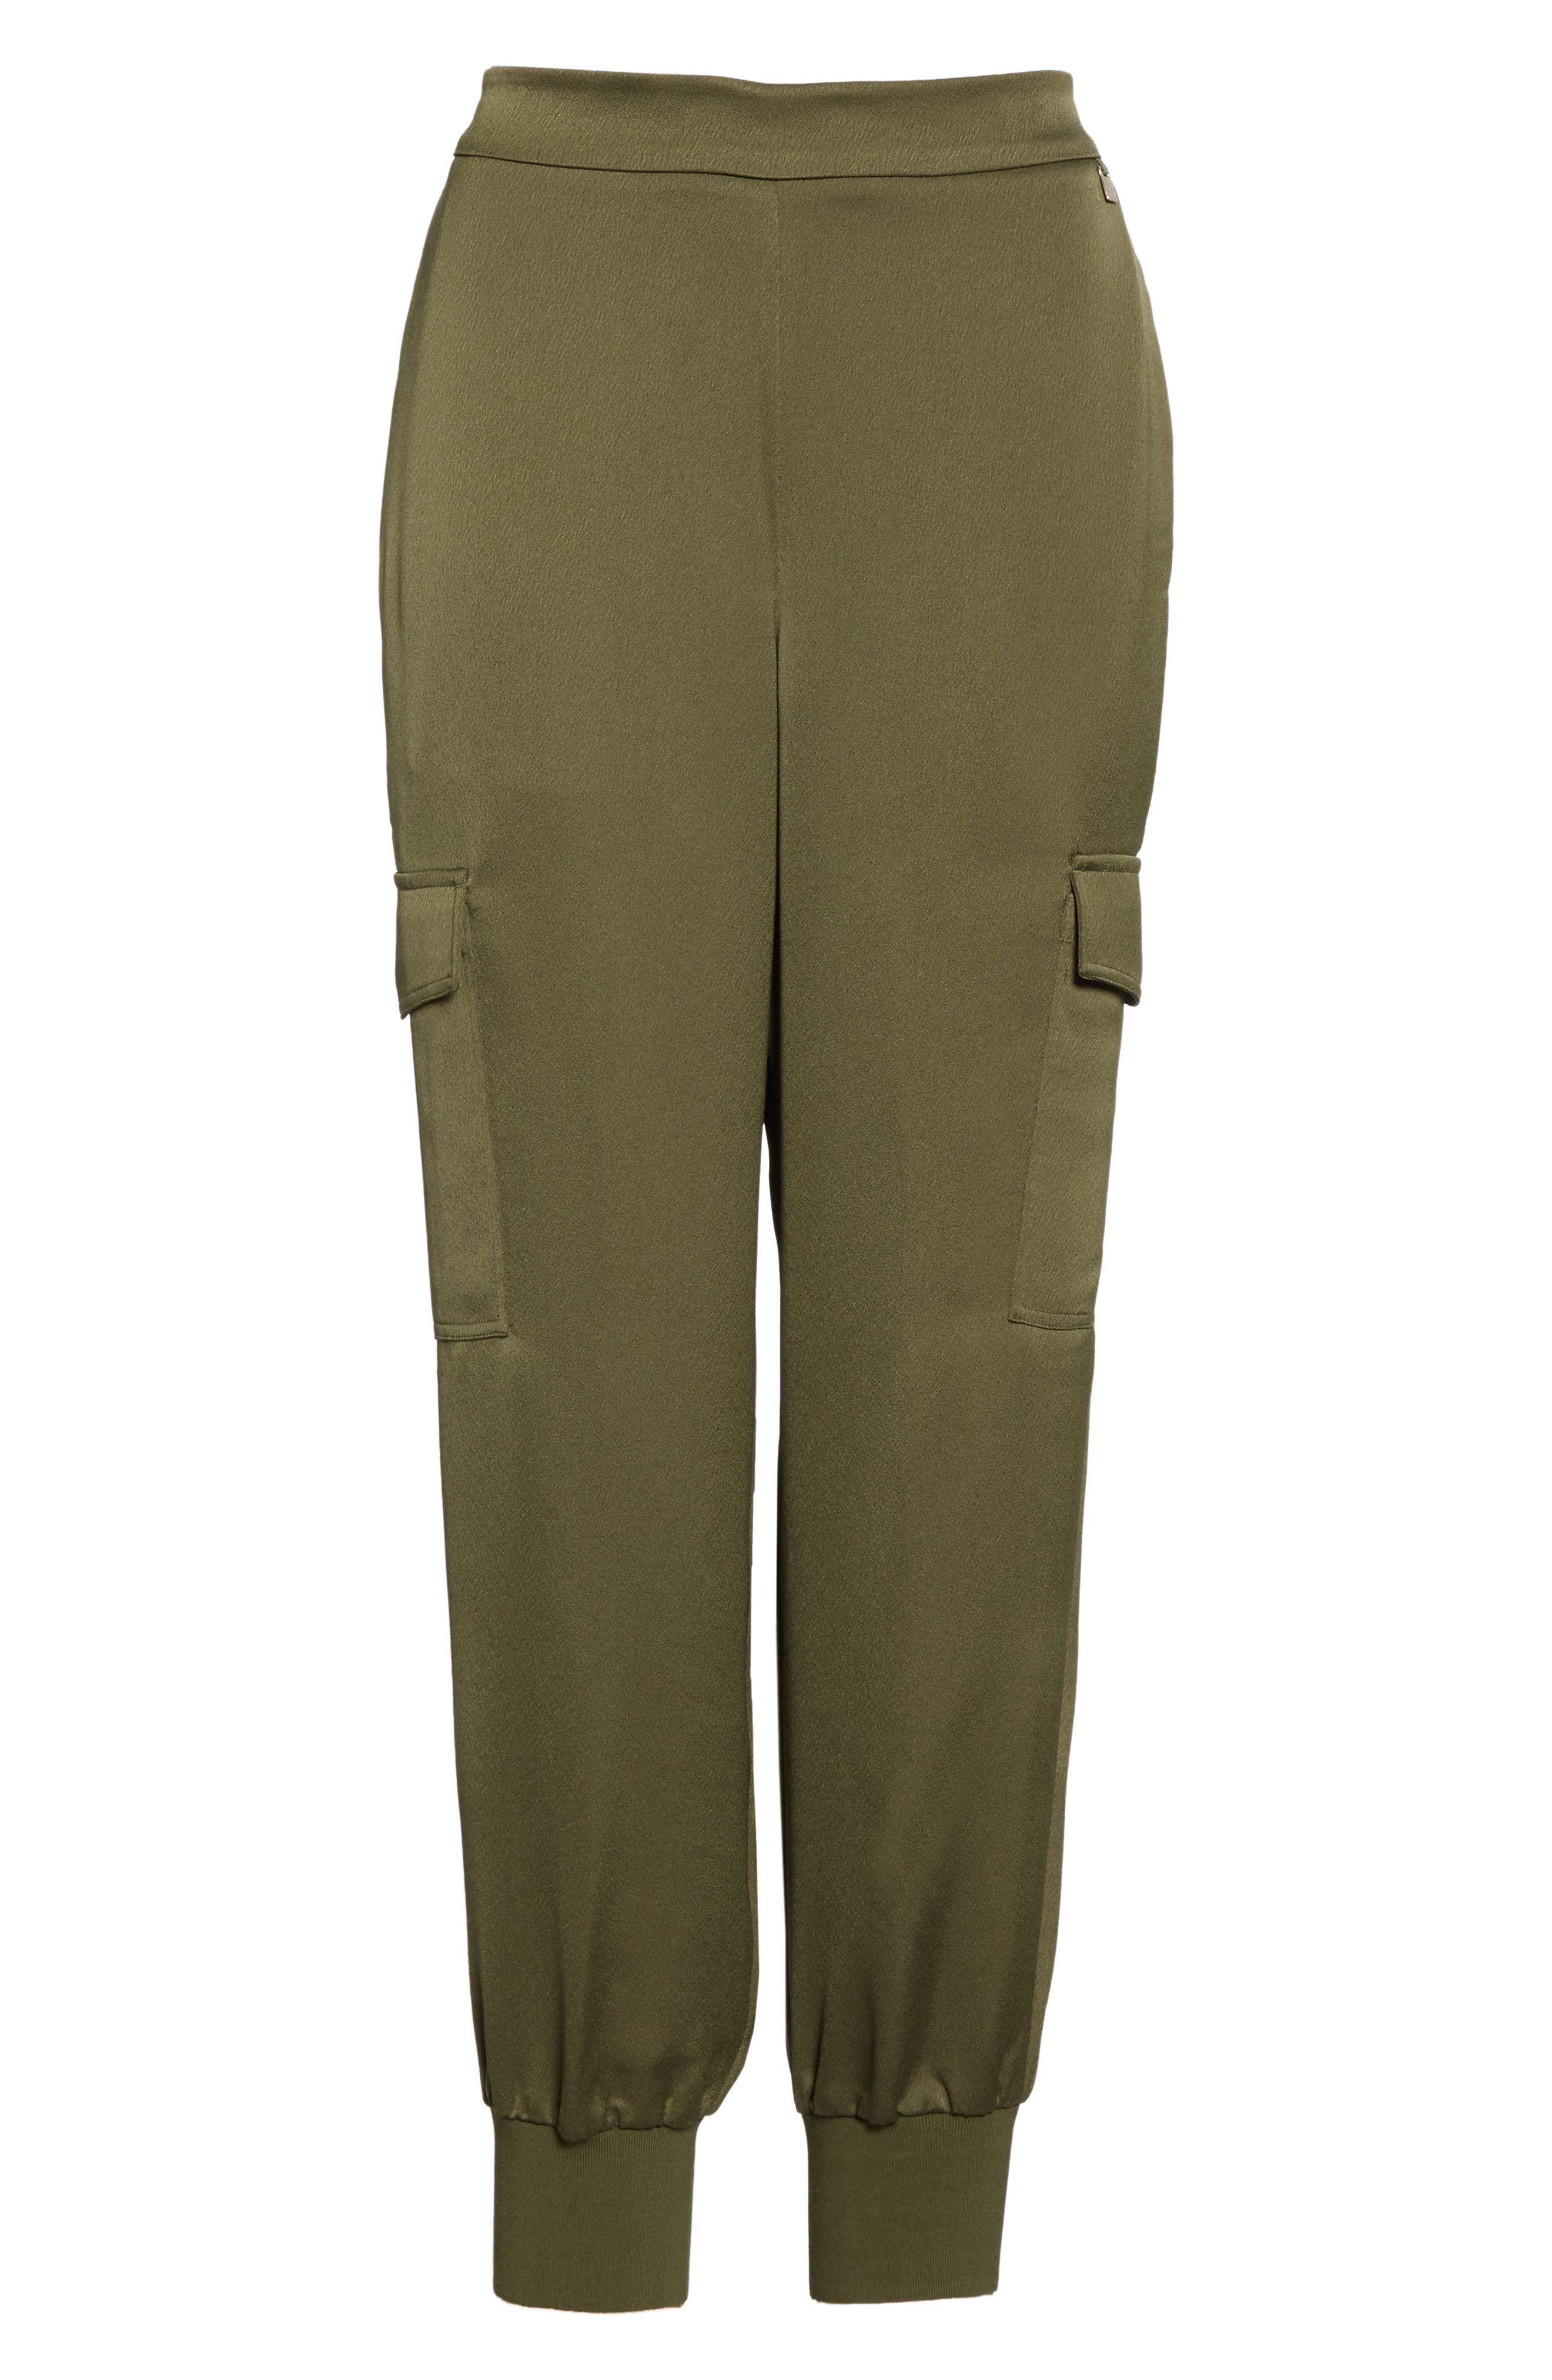 TED BAKER LONDON,                             Sulia Cargo Ankle Jogger Pants,                             Alternate thumbnail 6, color,                             KHAKI